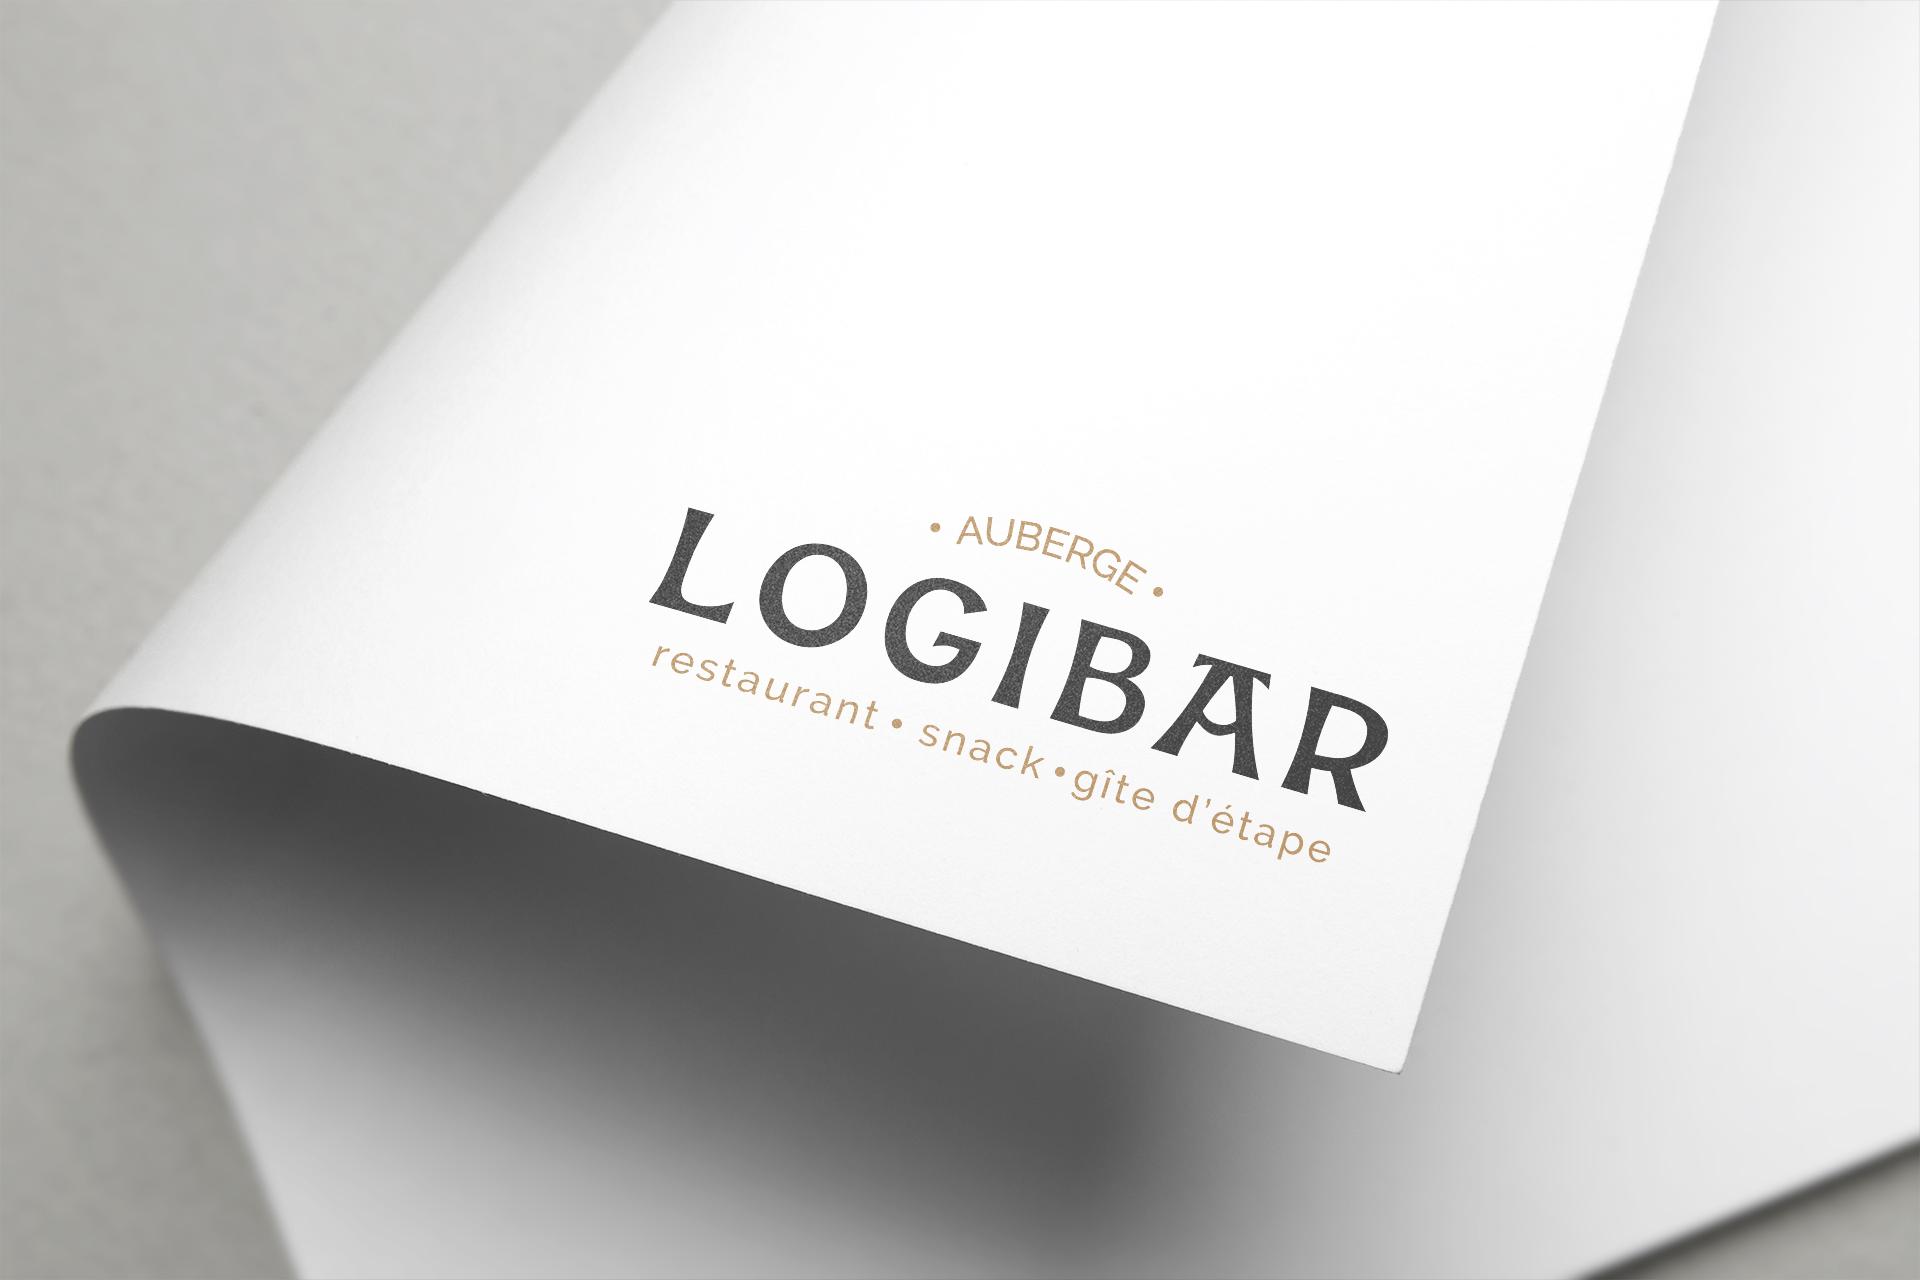 Logo Auberge Logibar